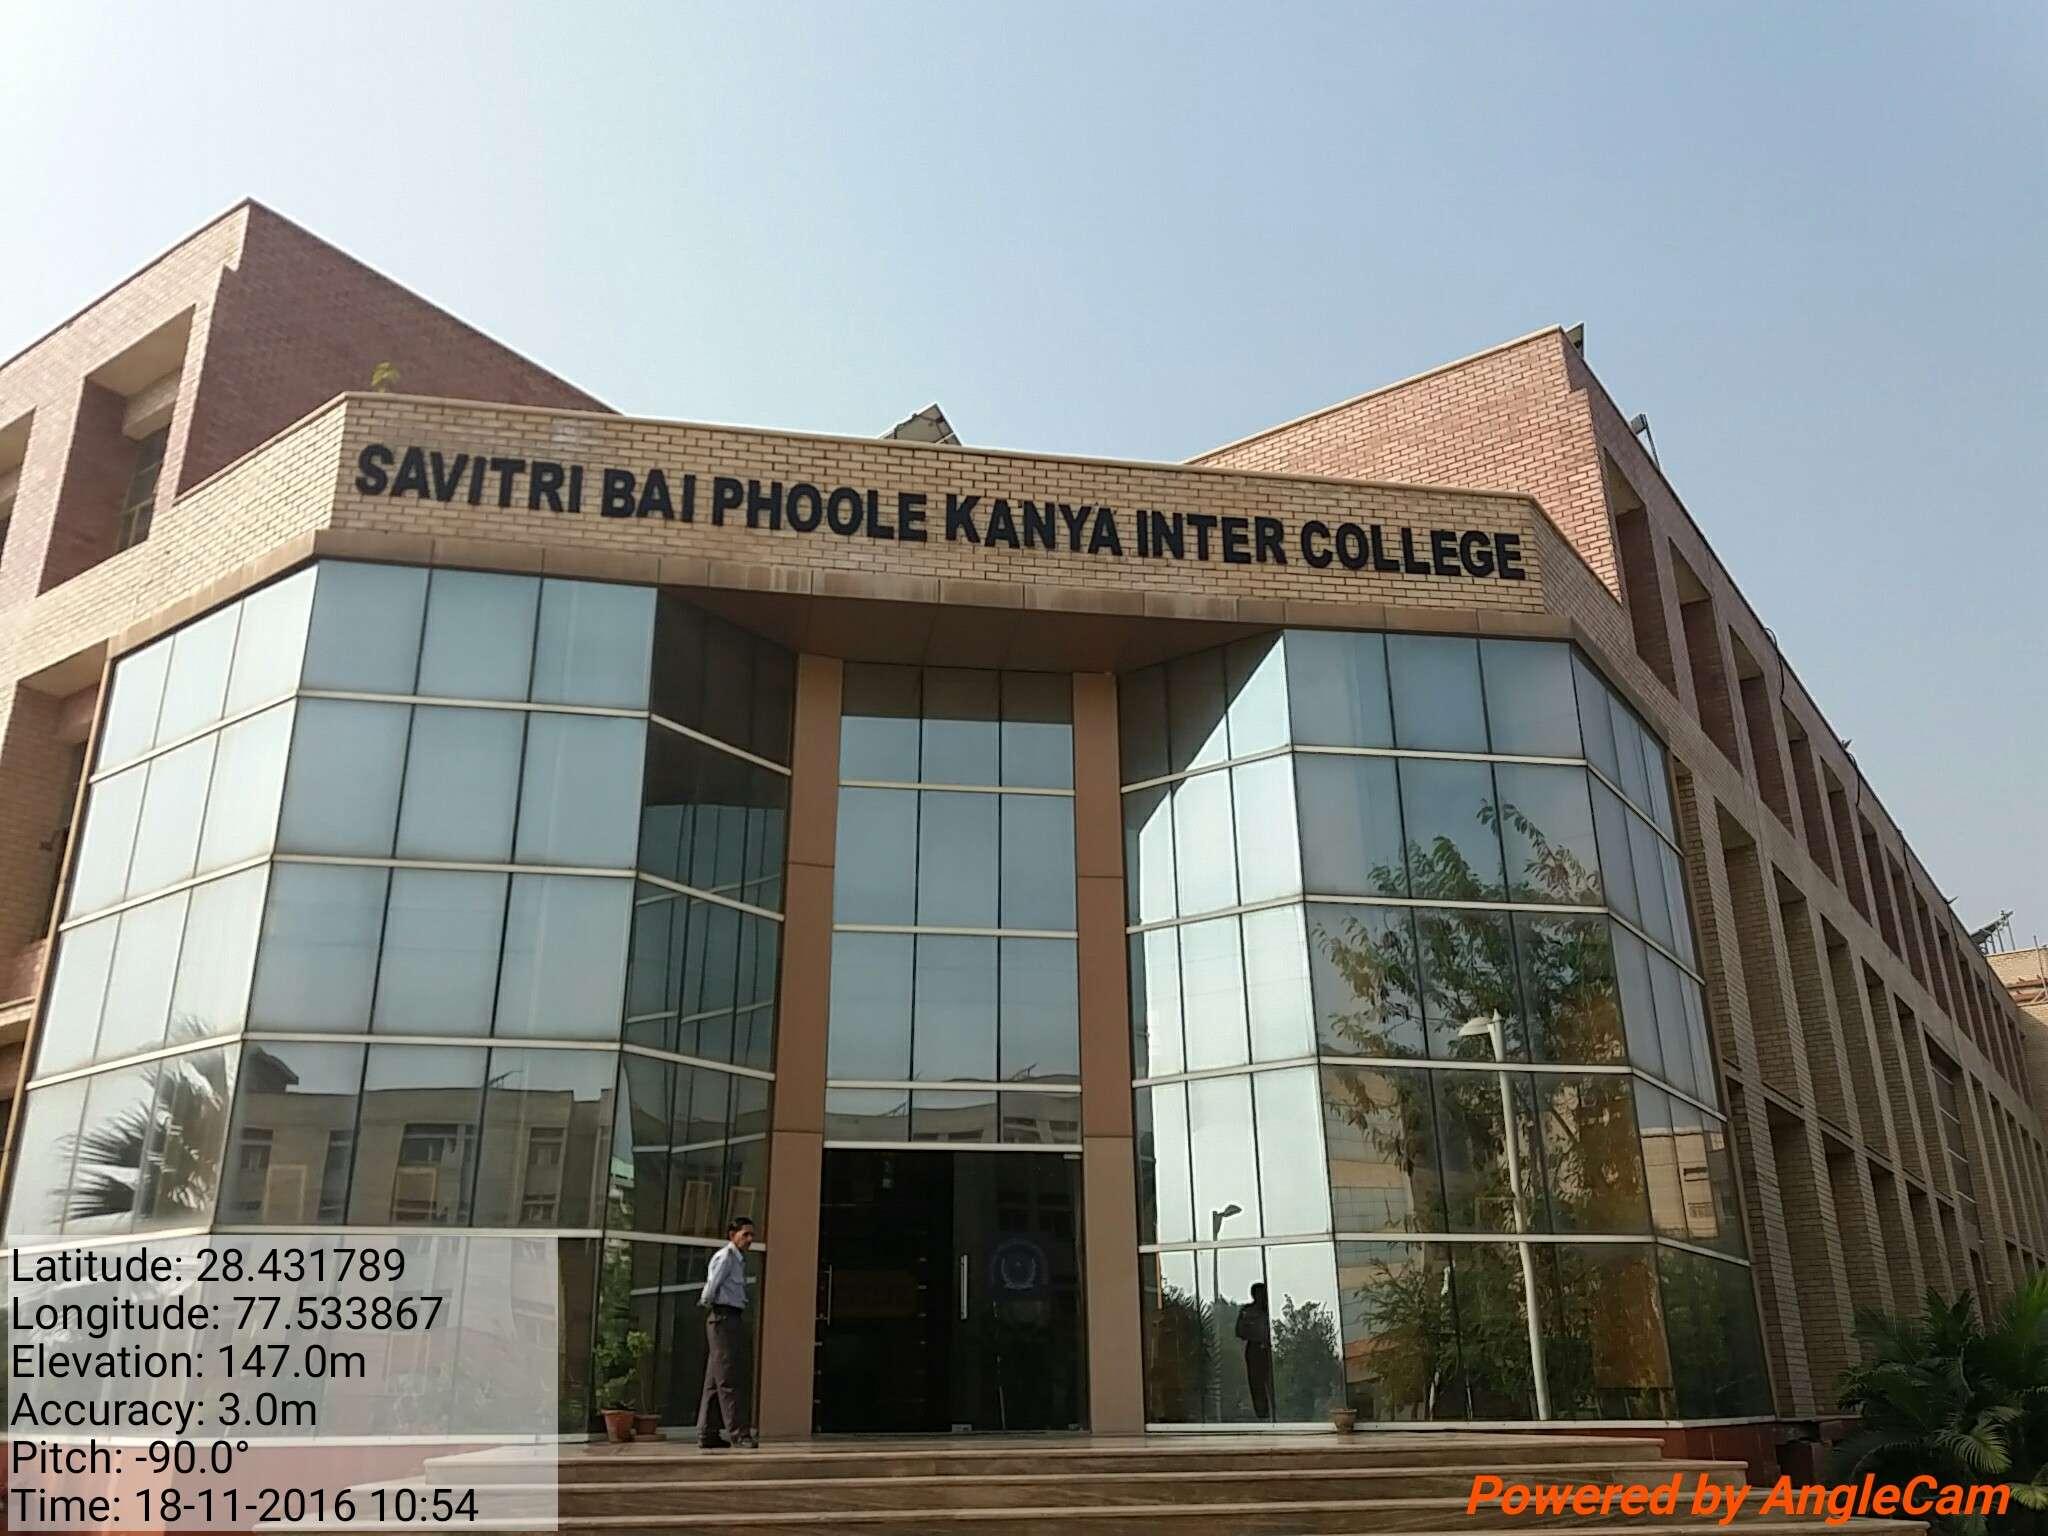 Savitri Bai Phule Balika Inter College Near Gautam Budh University Greater Noida 2131253